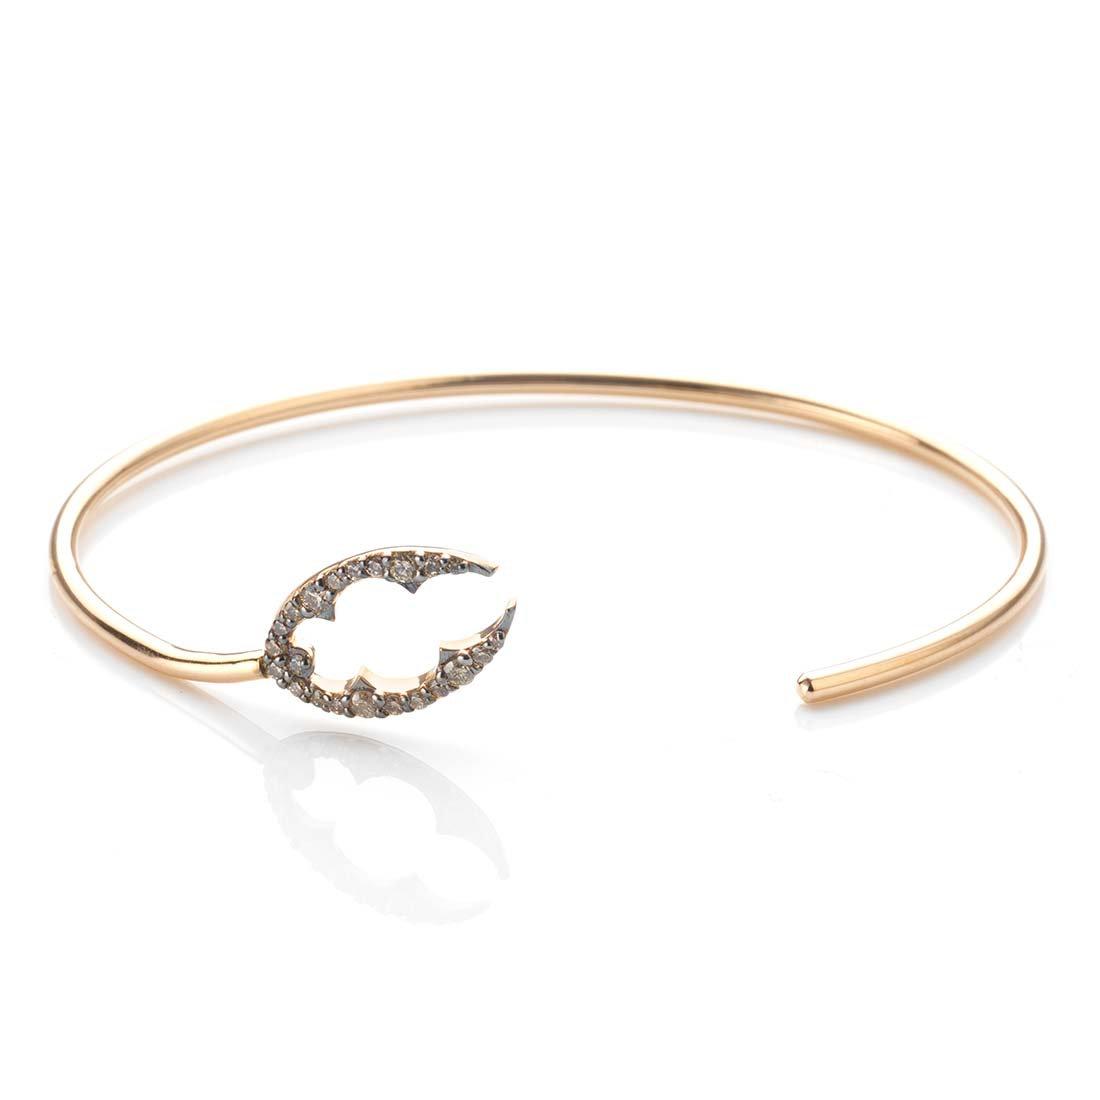 Gold Lobster Claw Bracelet